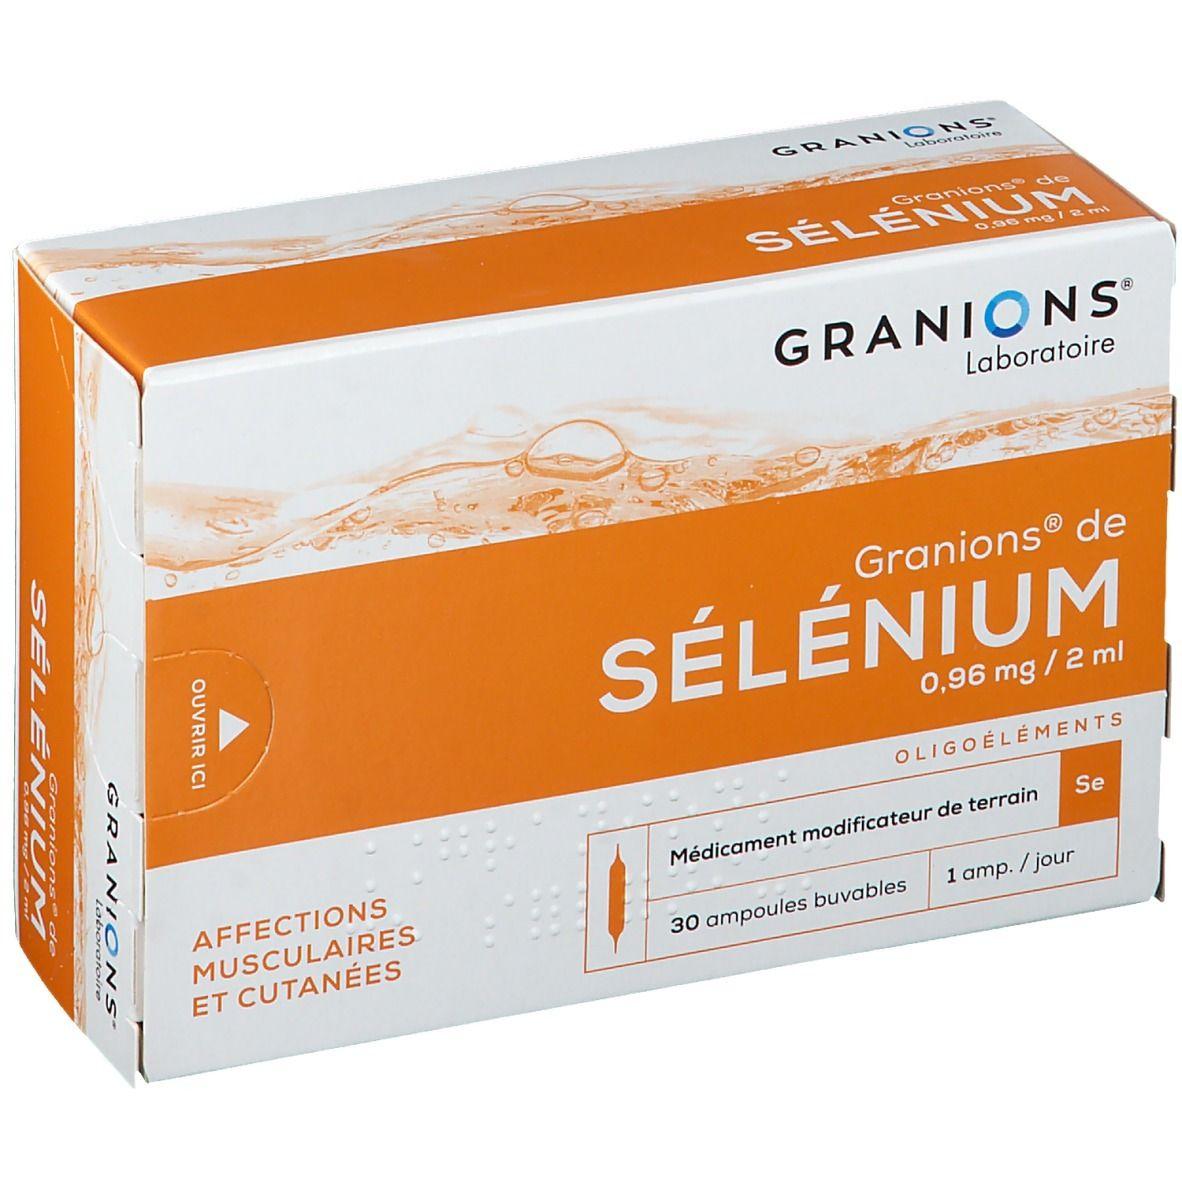 Granions® de Selenium 0,96 mg/2 mL ml suspension(s) buvable(s)